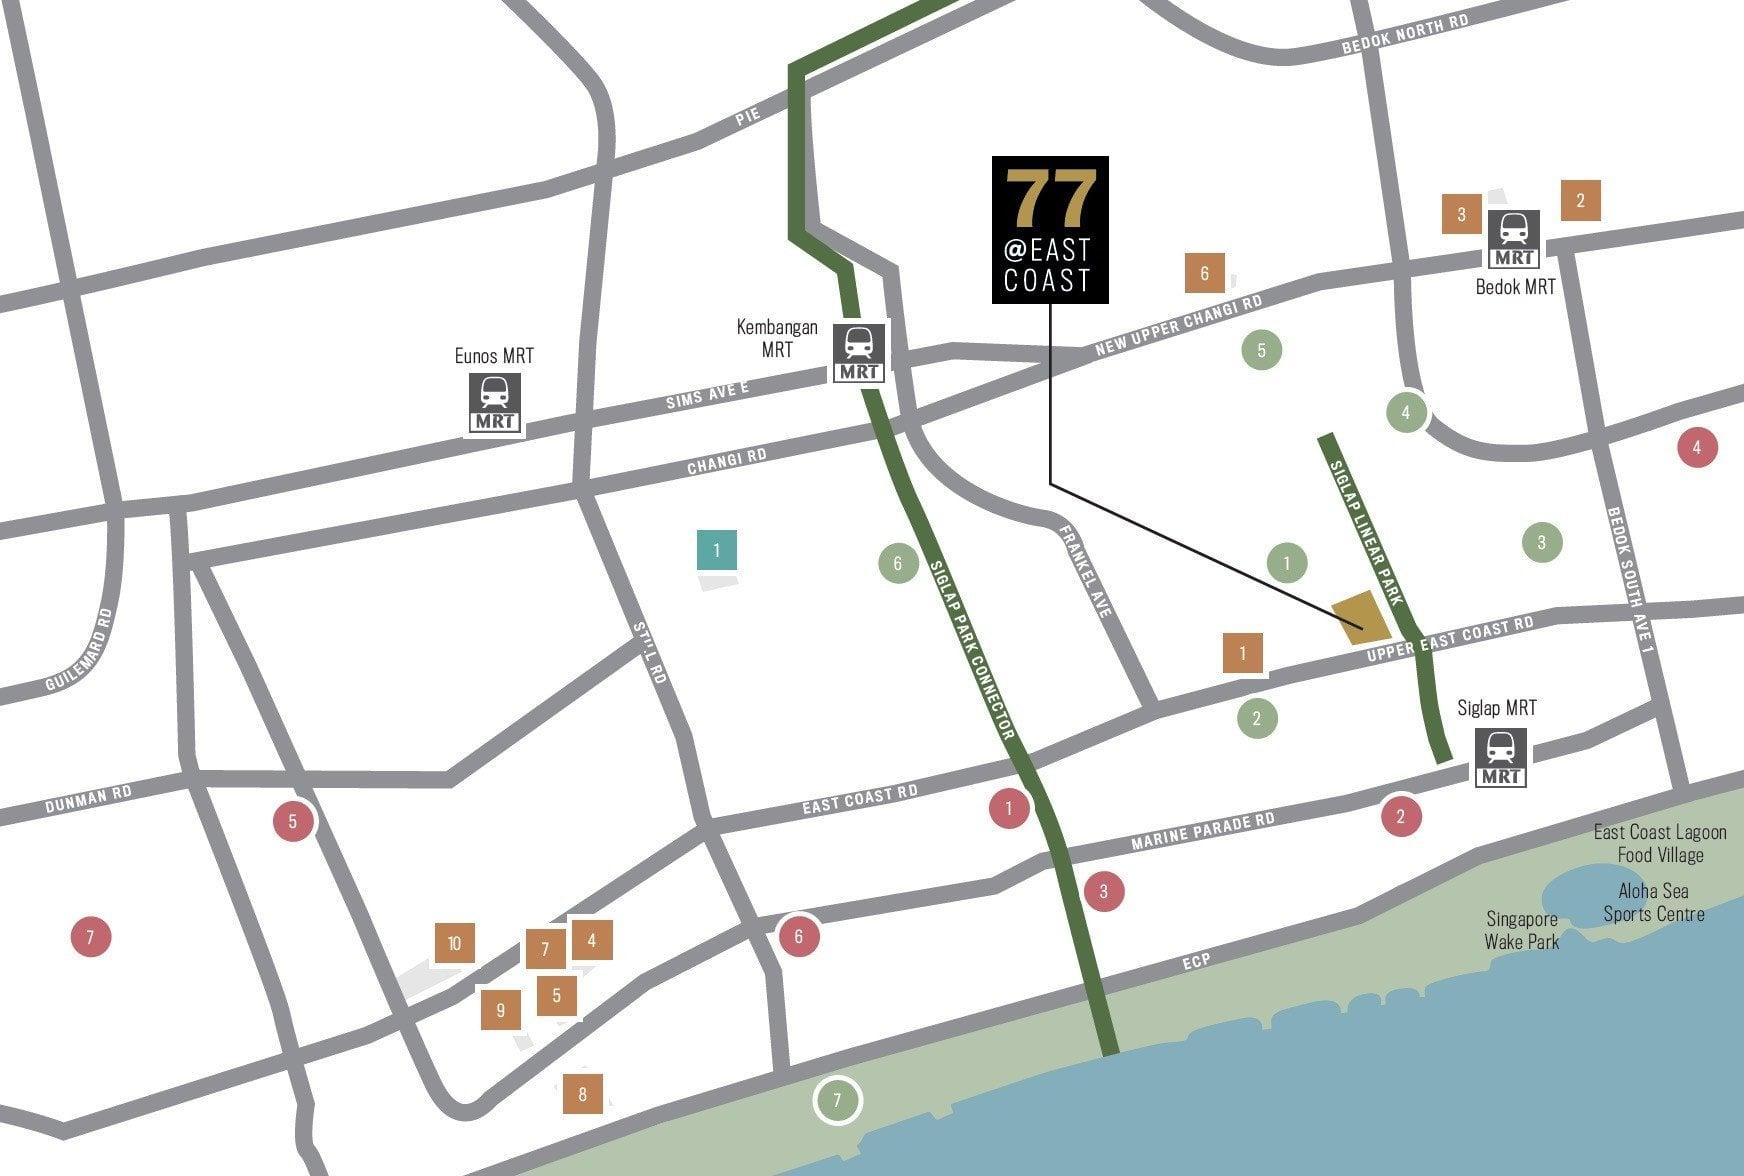 77 east coast location map